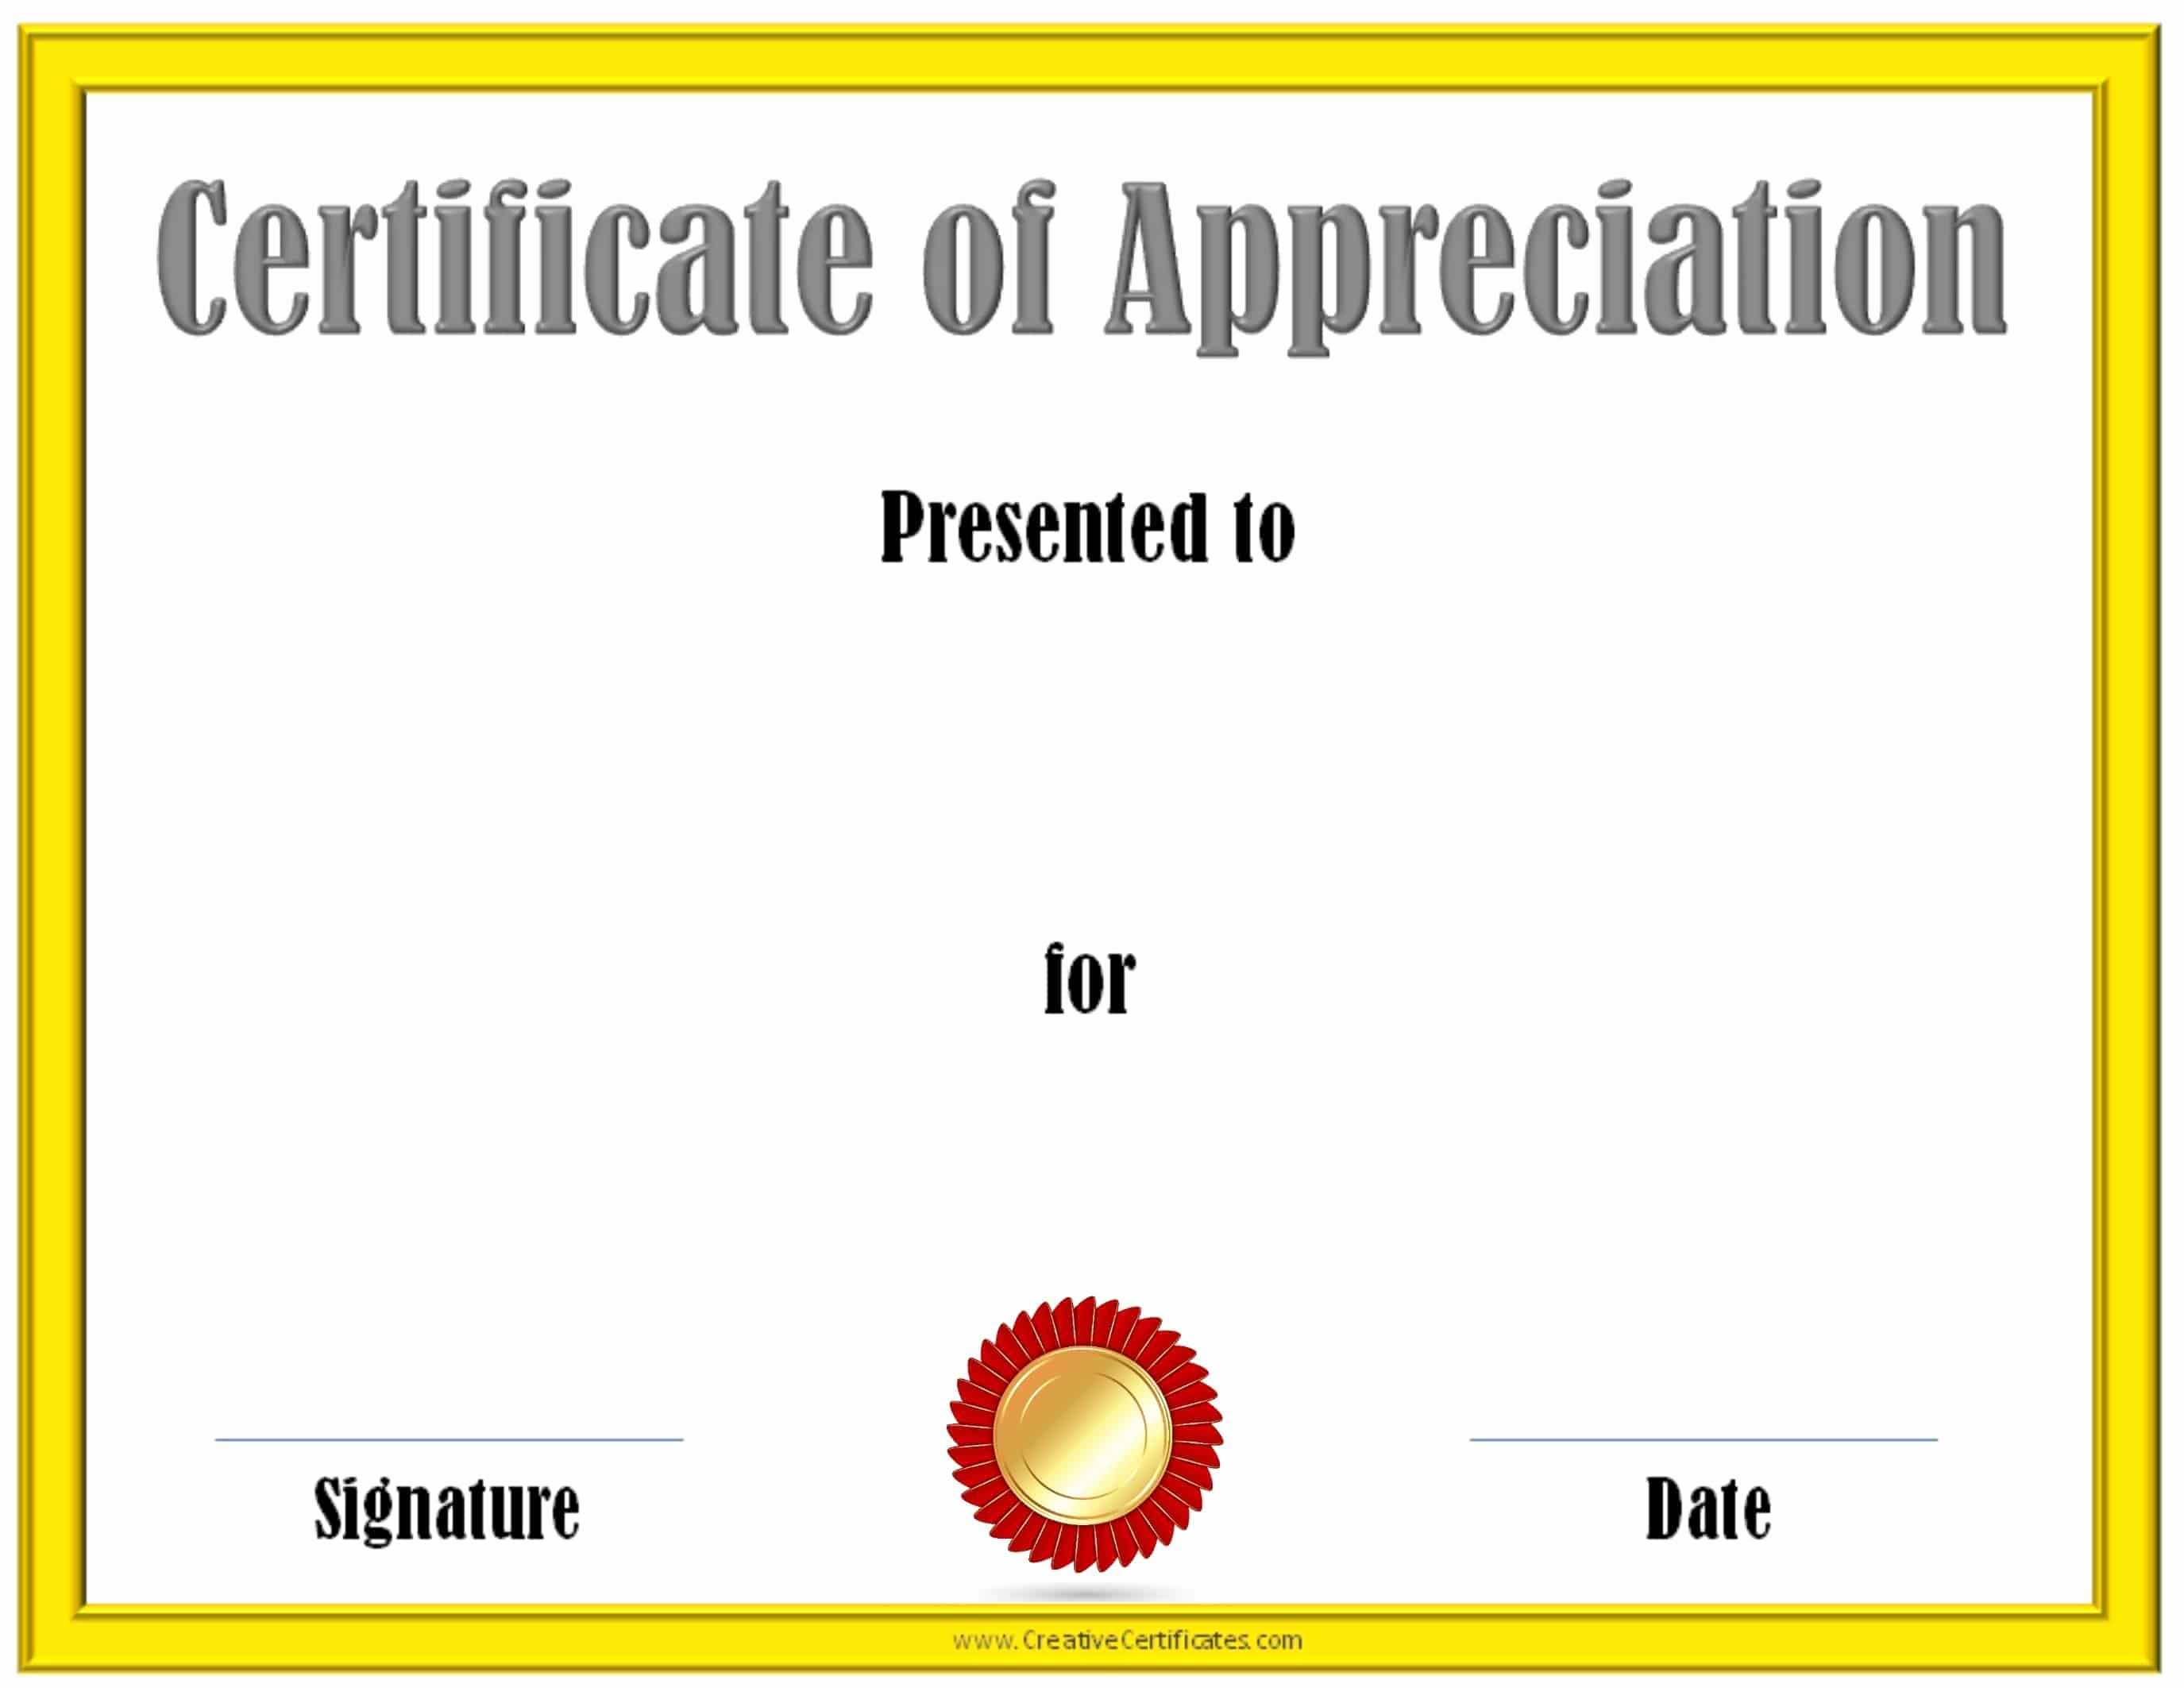 Printable Certificate Of Appreciation Template Fresh Free Editable Certificate Of Appreciation